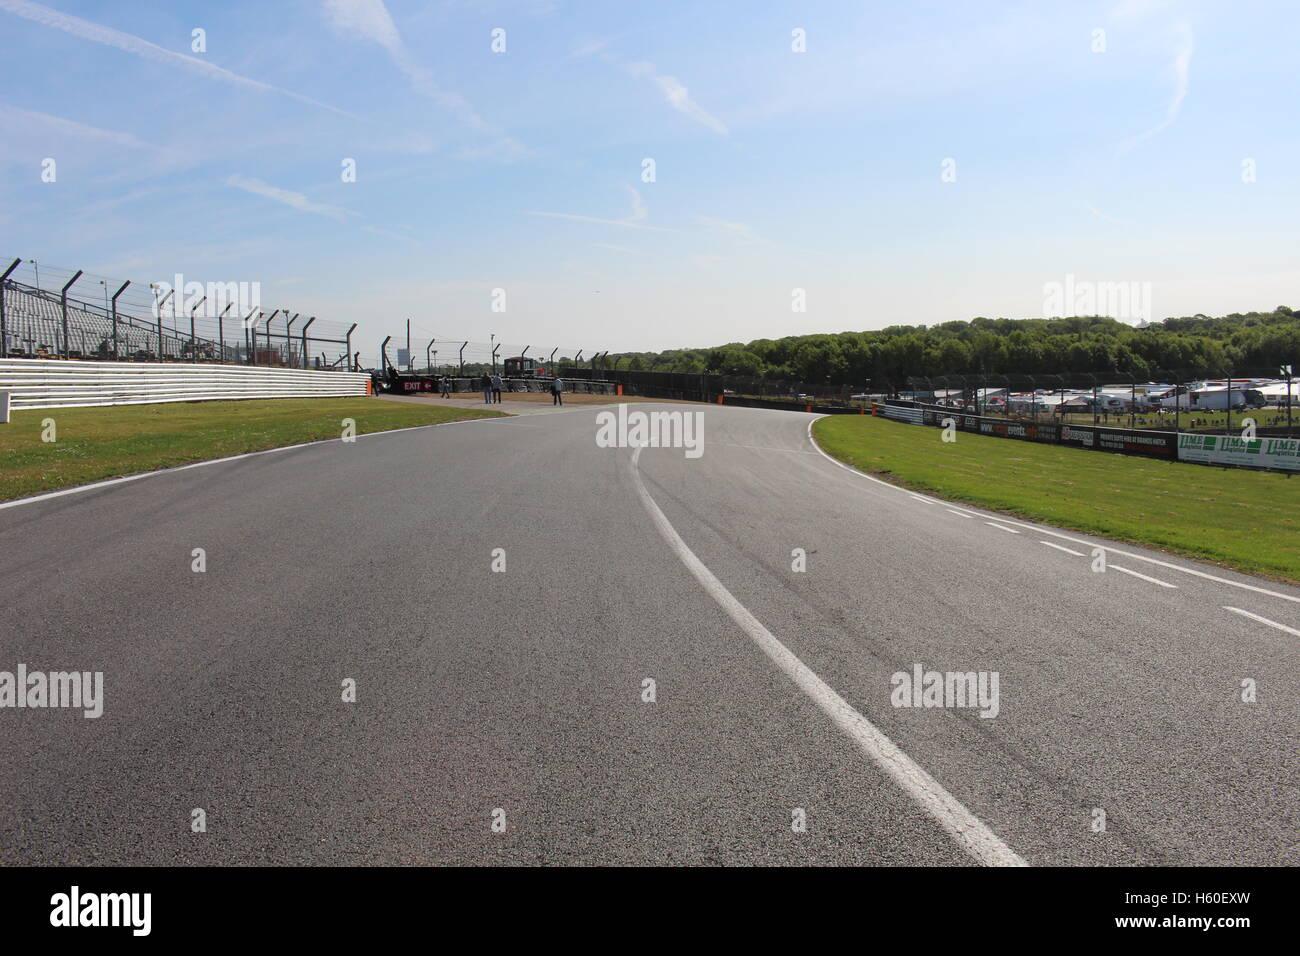 Brands Hatch Brabham straight onto paddockhill bend - Stock Image